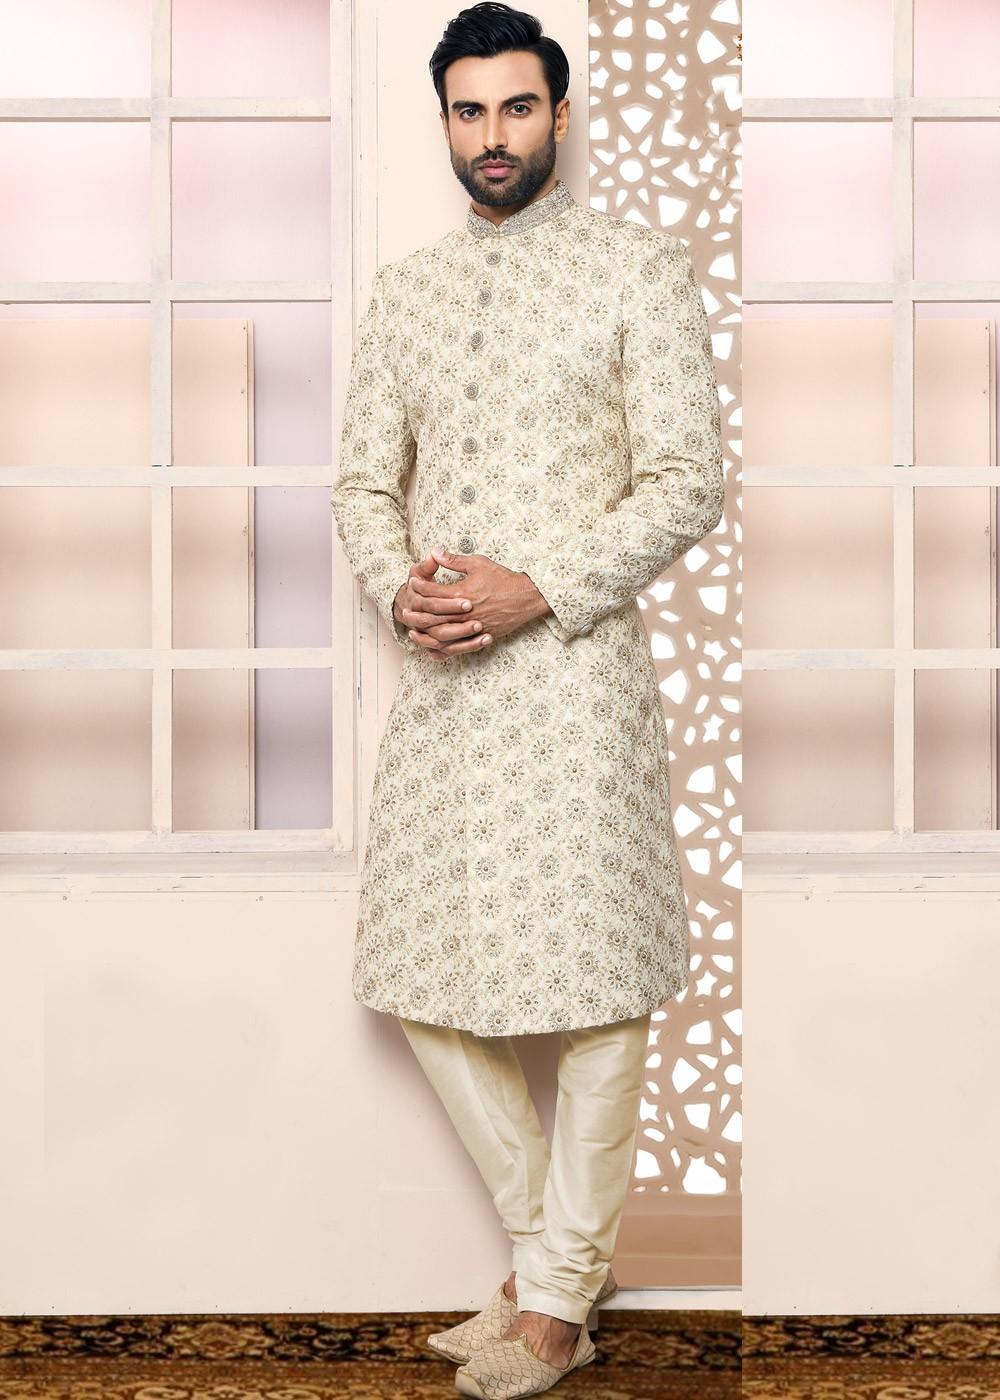 62eae20f25 Buy Off-White Embroidered Art Silk Indian Wedding Sherwani for Groom ...